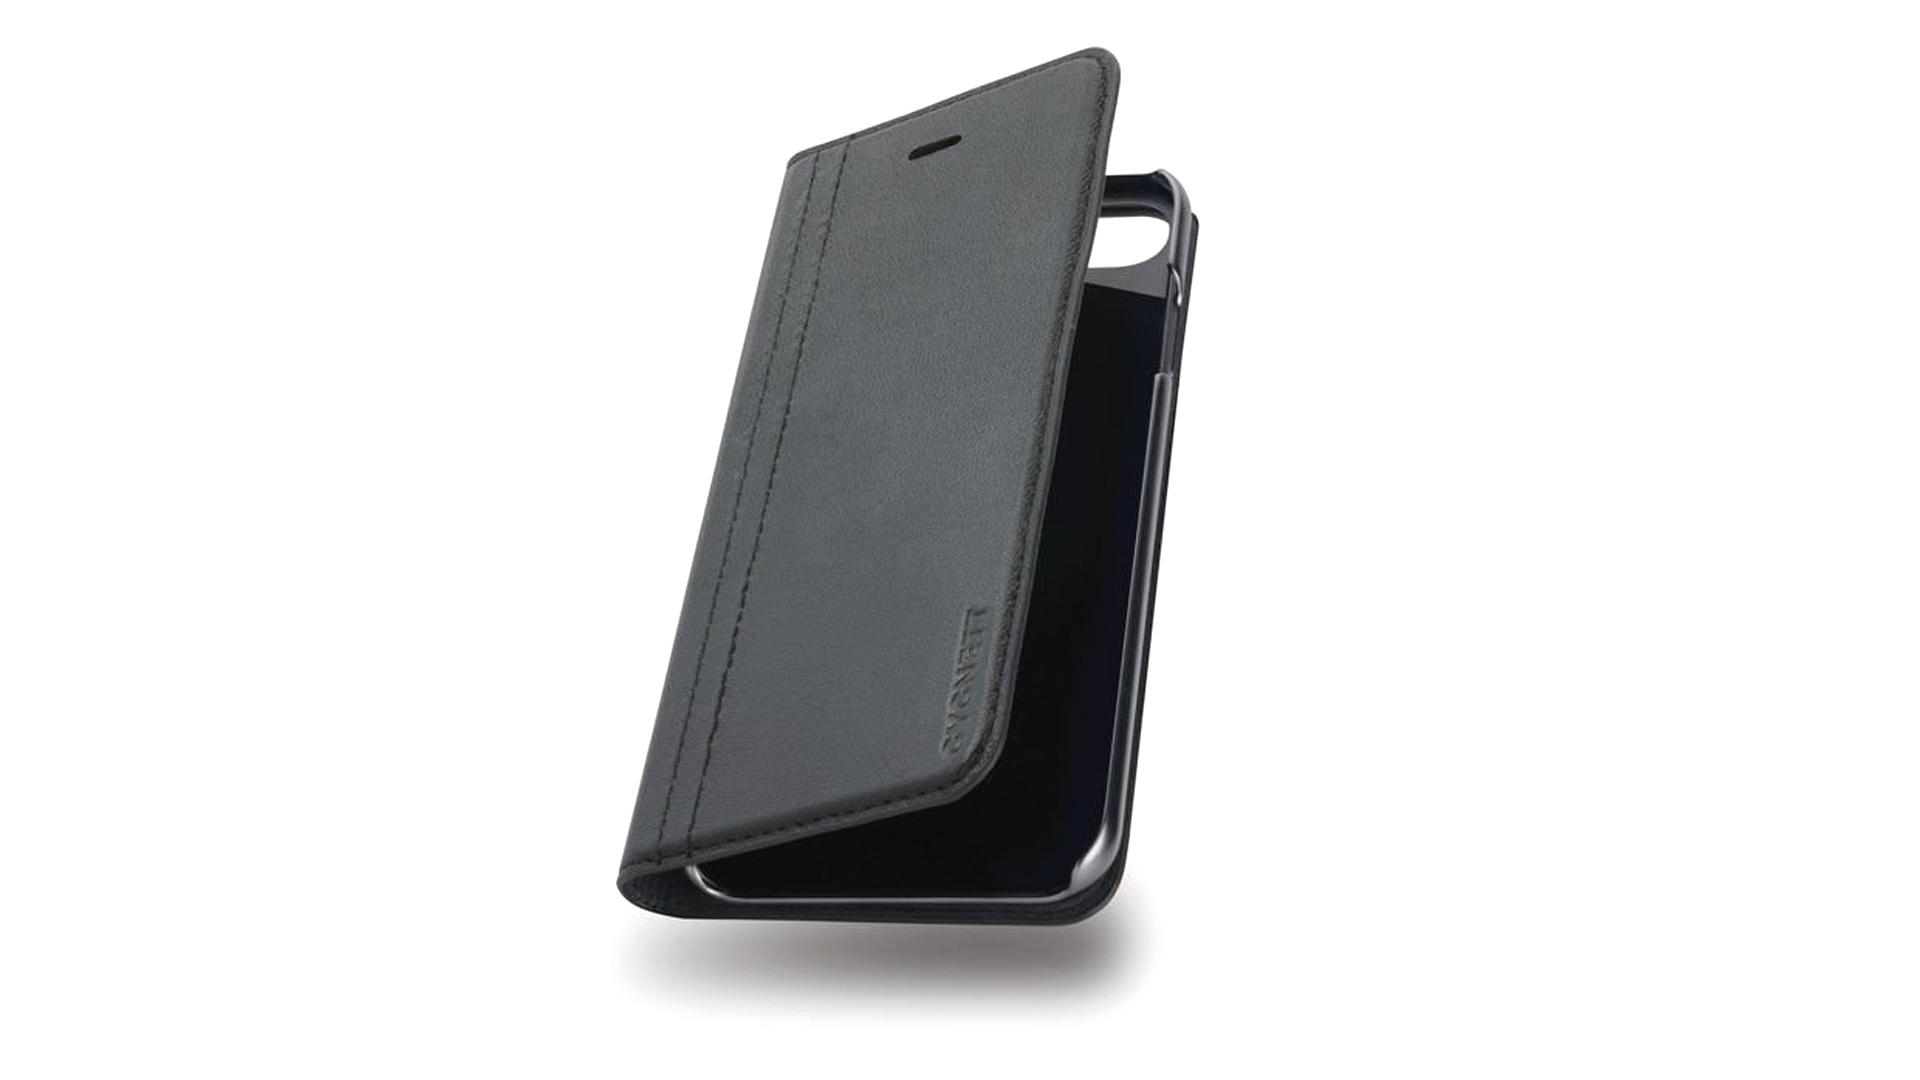 h2rzgaq9q3wEpTZxhmAmJP - The best iPhone 7 Plus cases